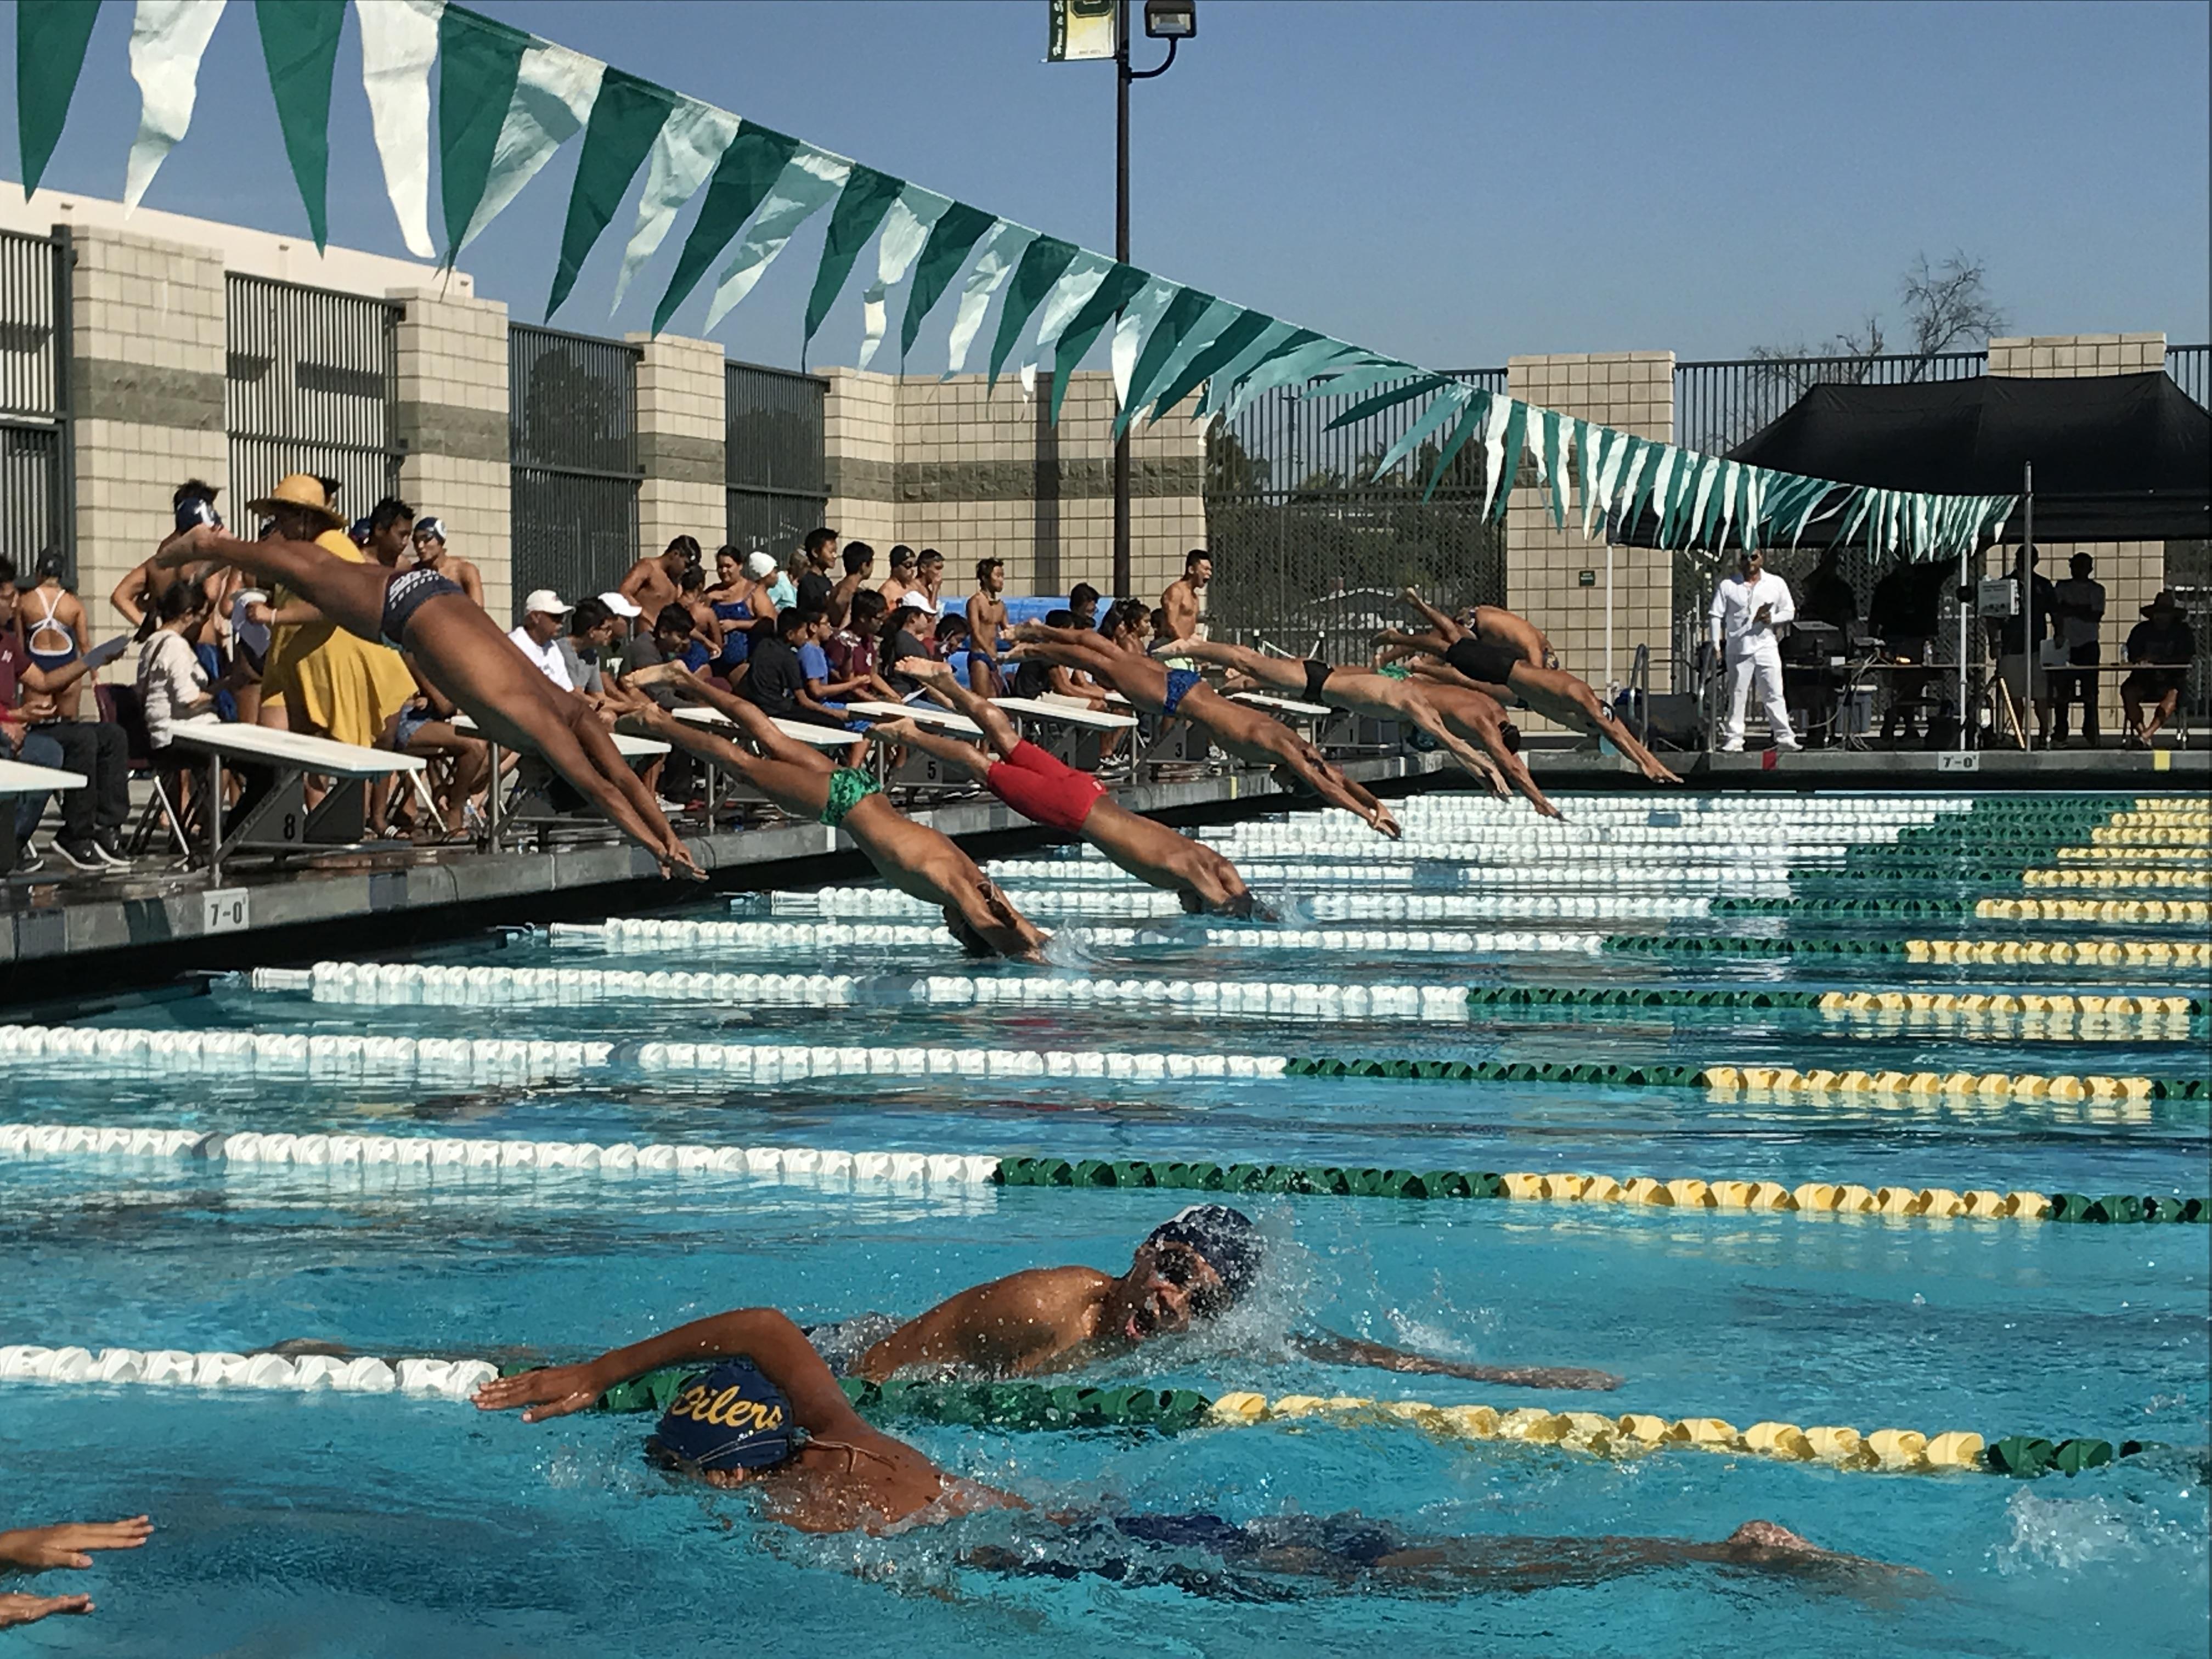 Swim splashes season as fourth in league